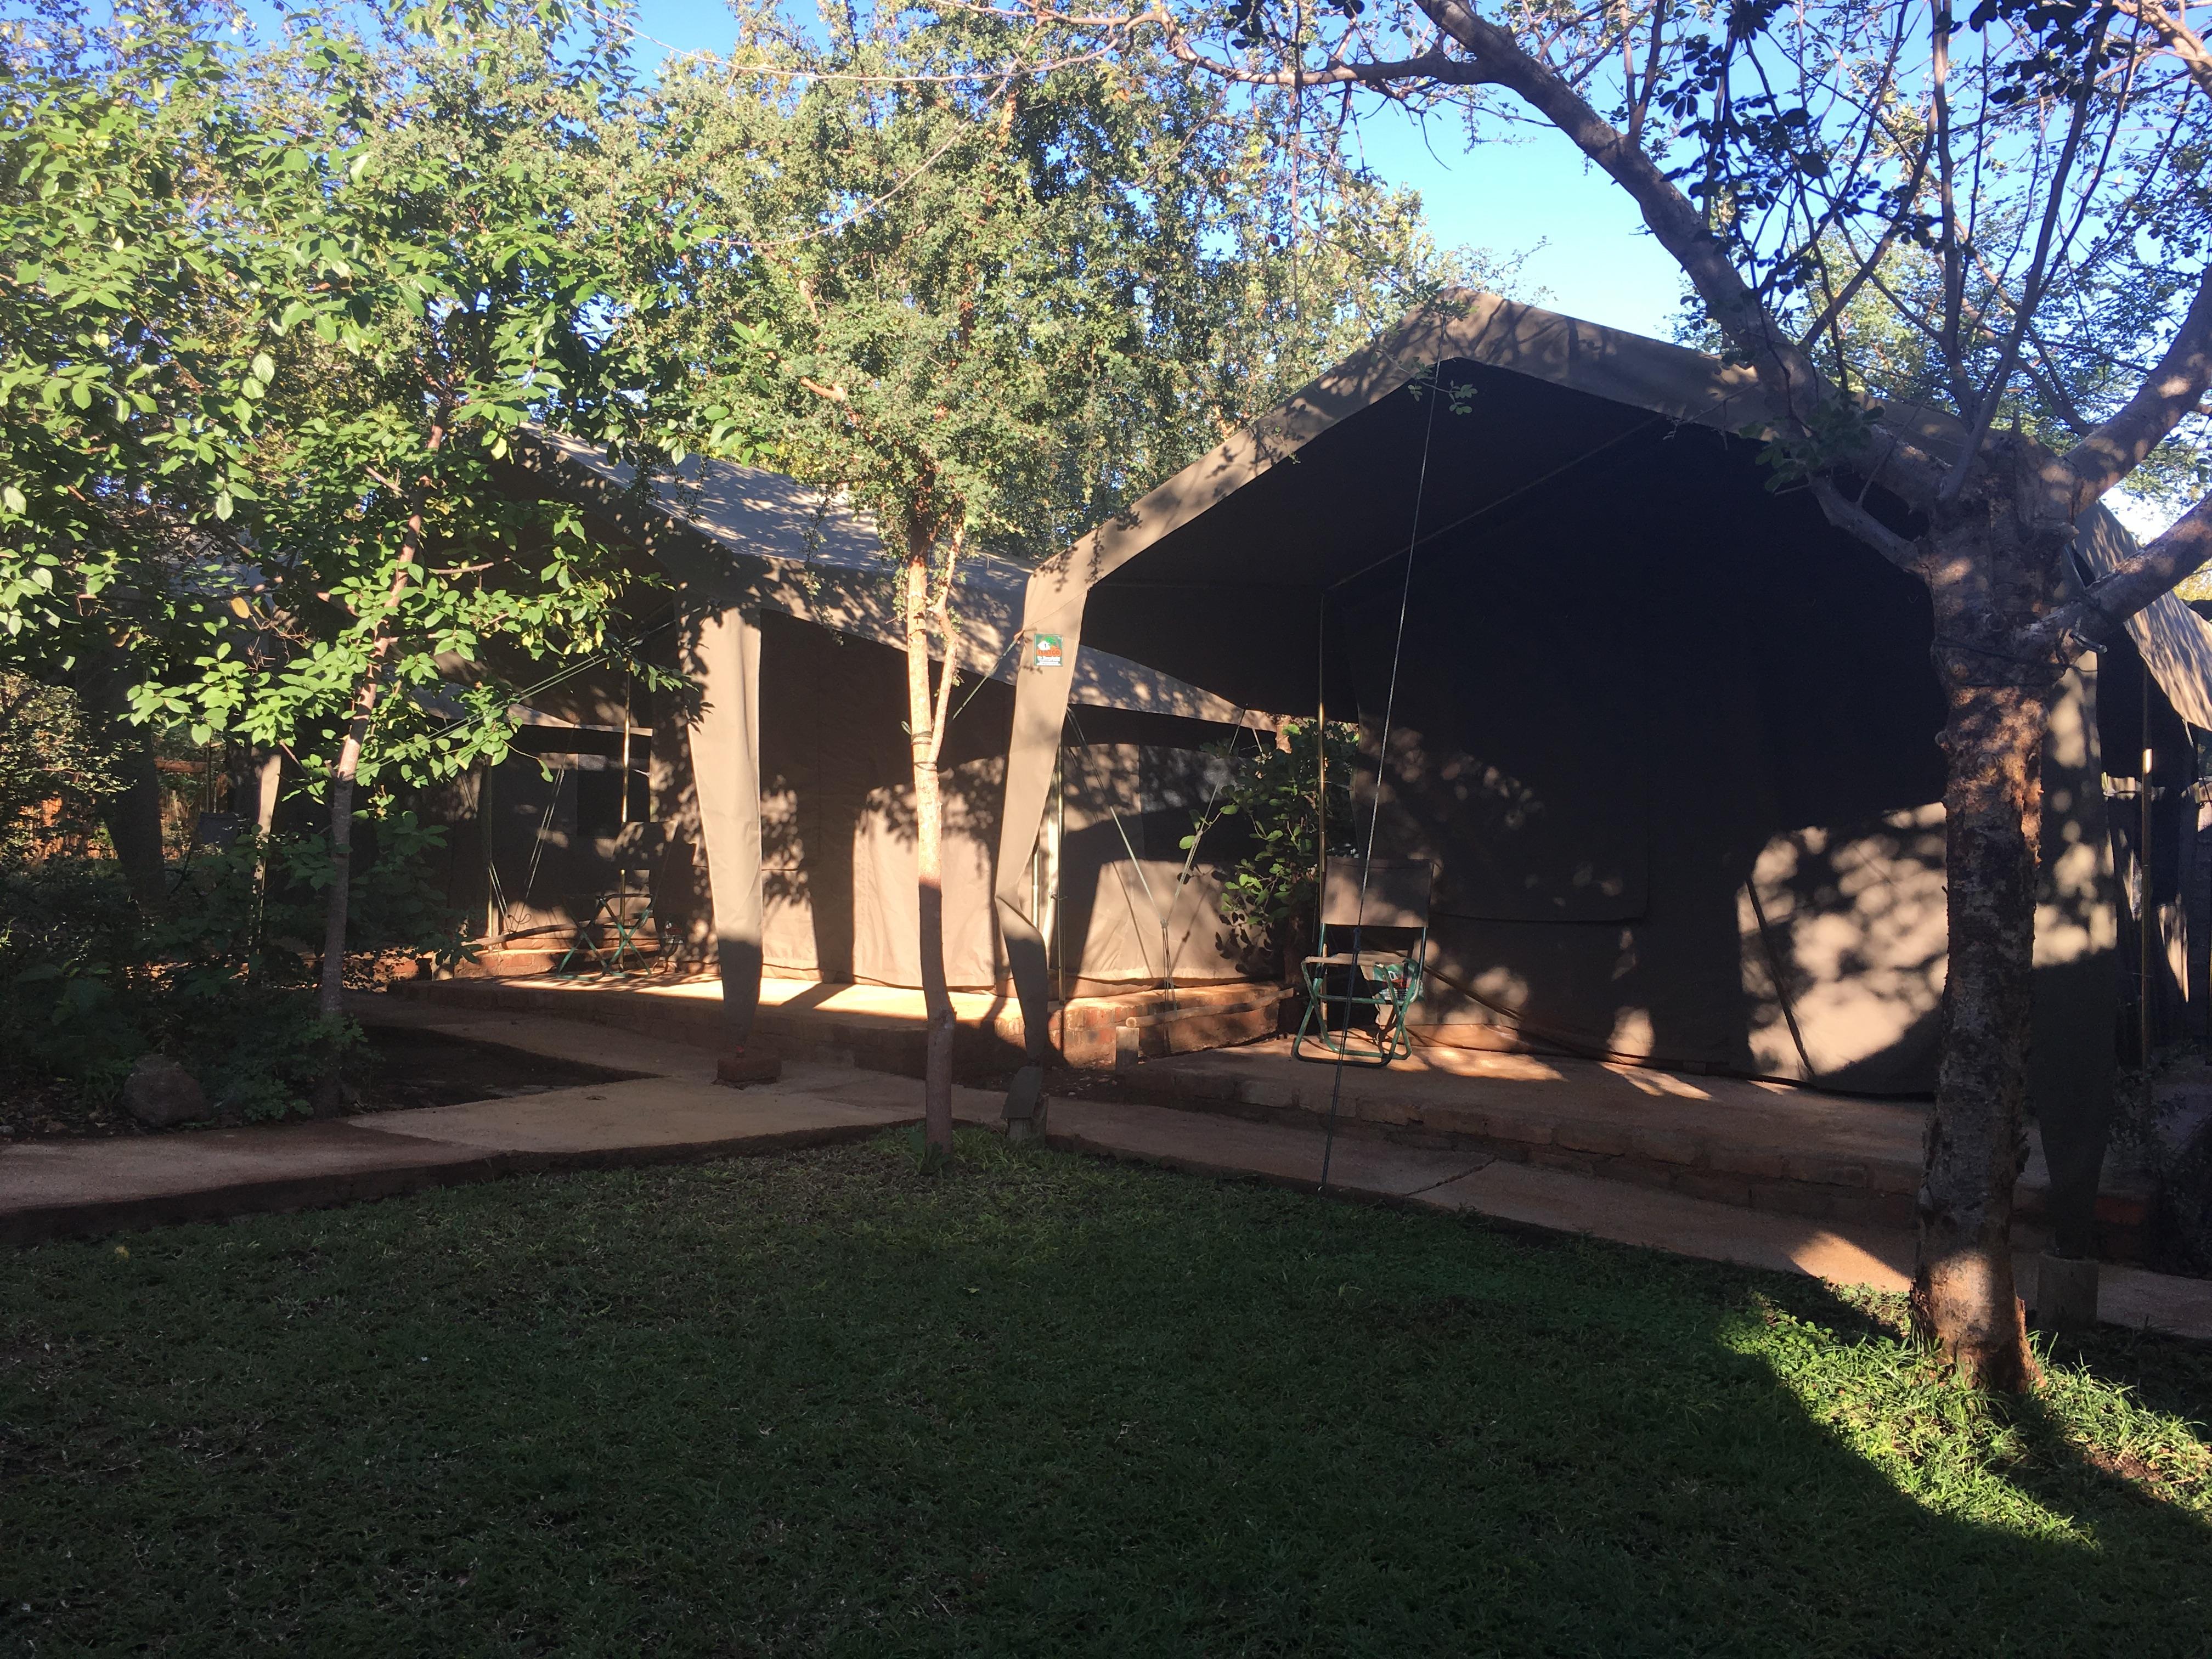 Safari Zelte der Volunteers bei diesem Afrika Freiwillingenprojekt in Südafrikas Krüger Park